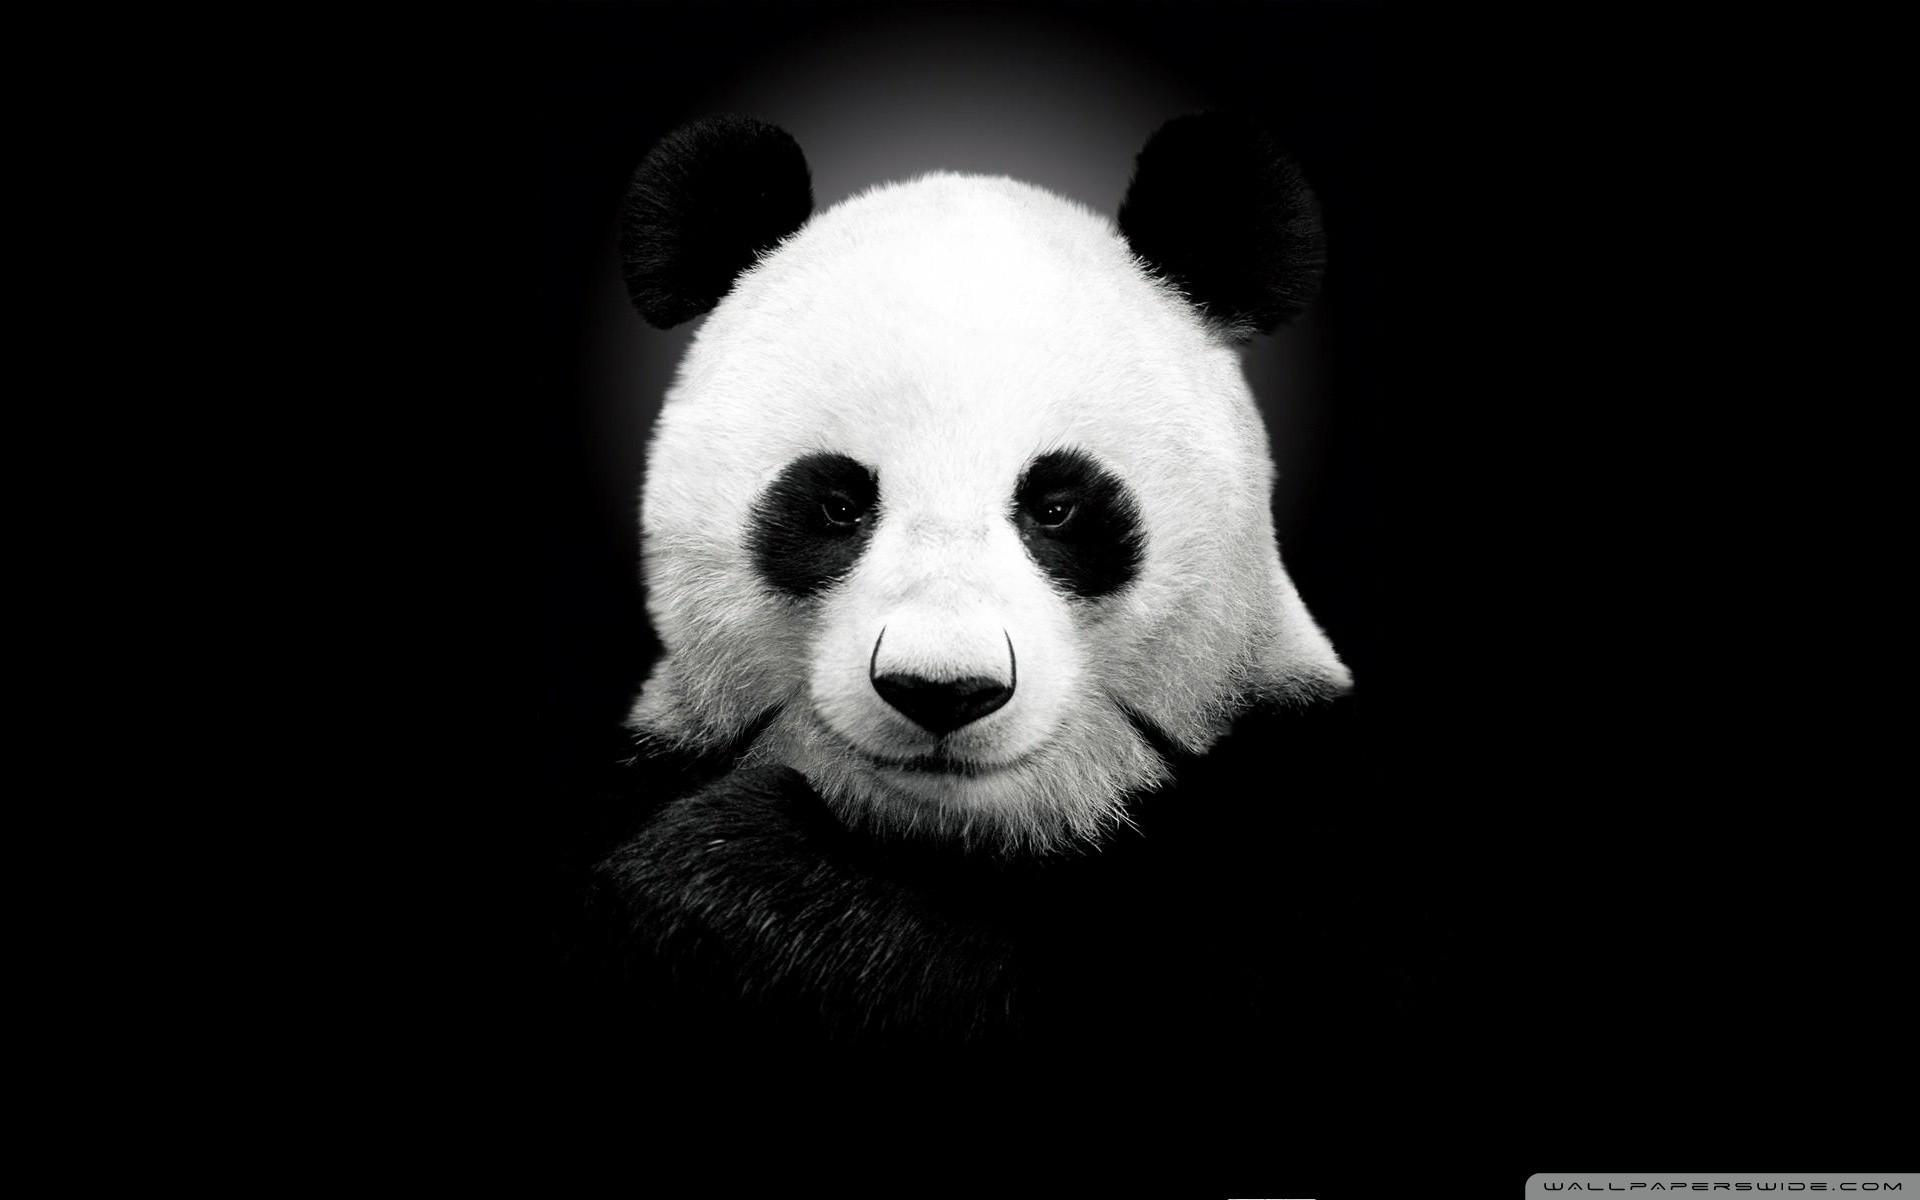 hinh gau truc panda 2